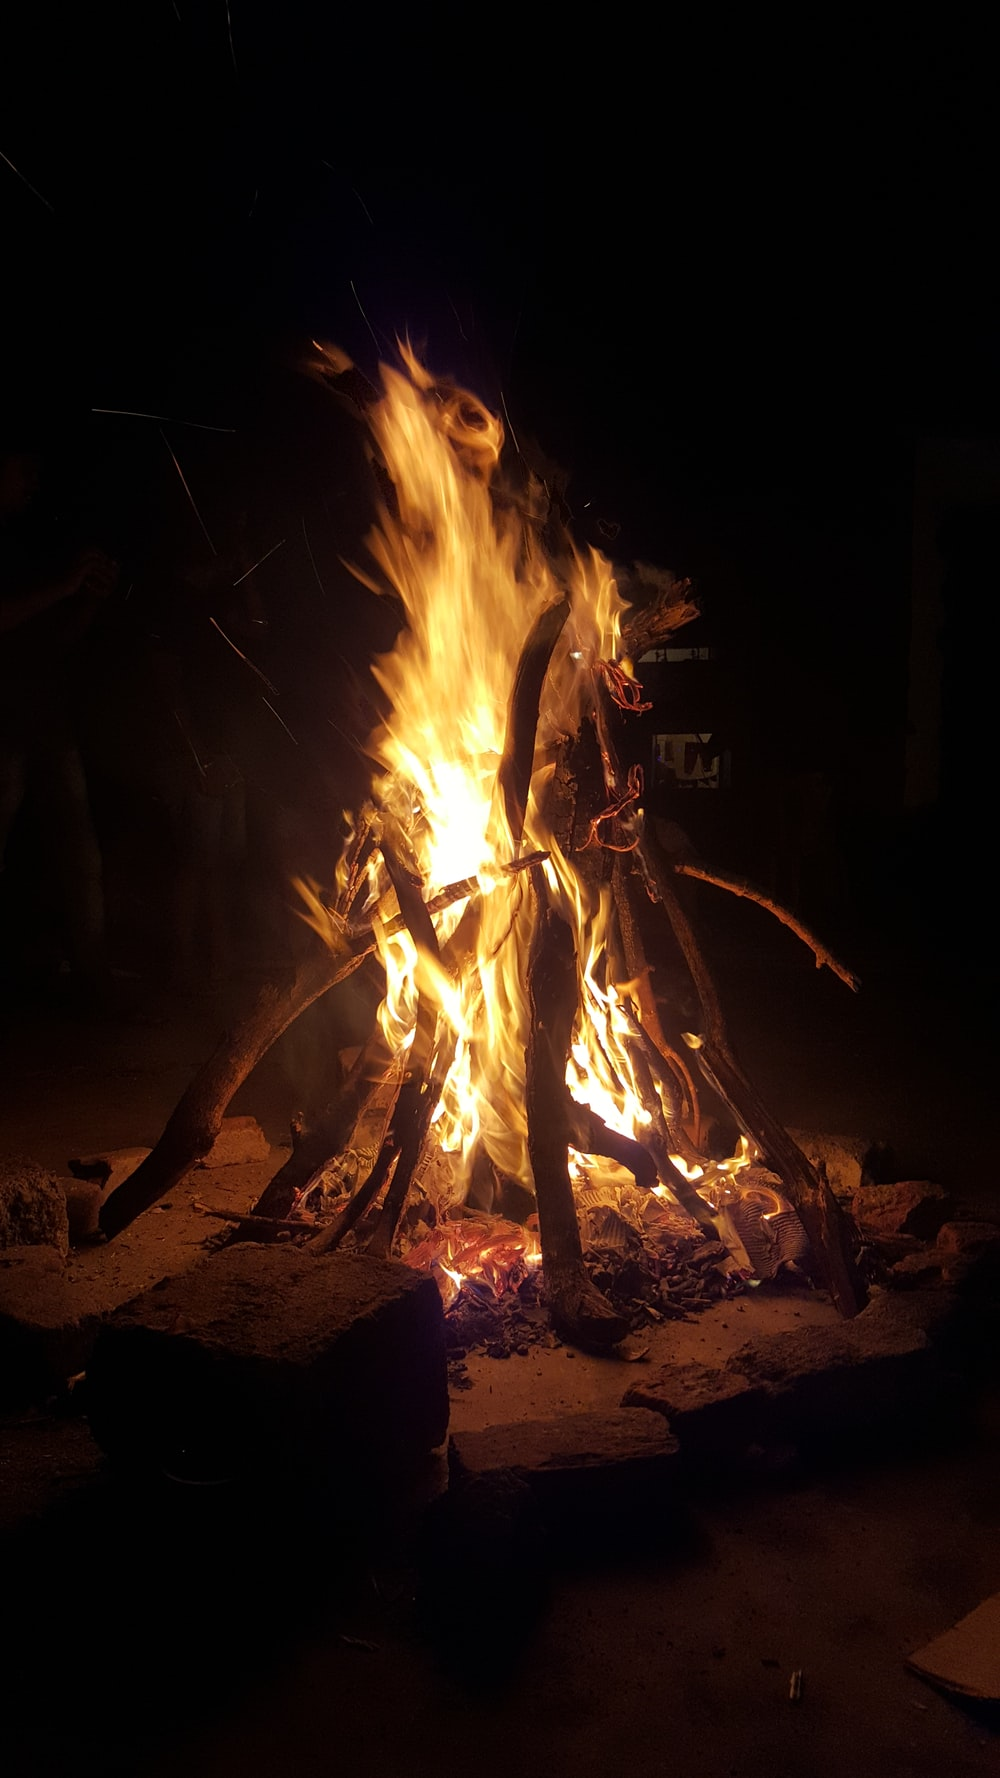 person standing near bonfire